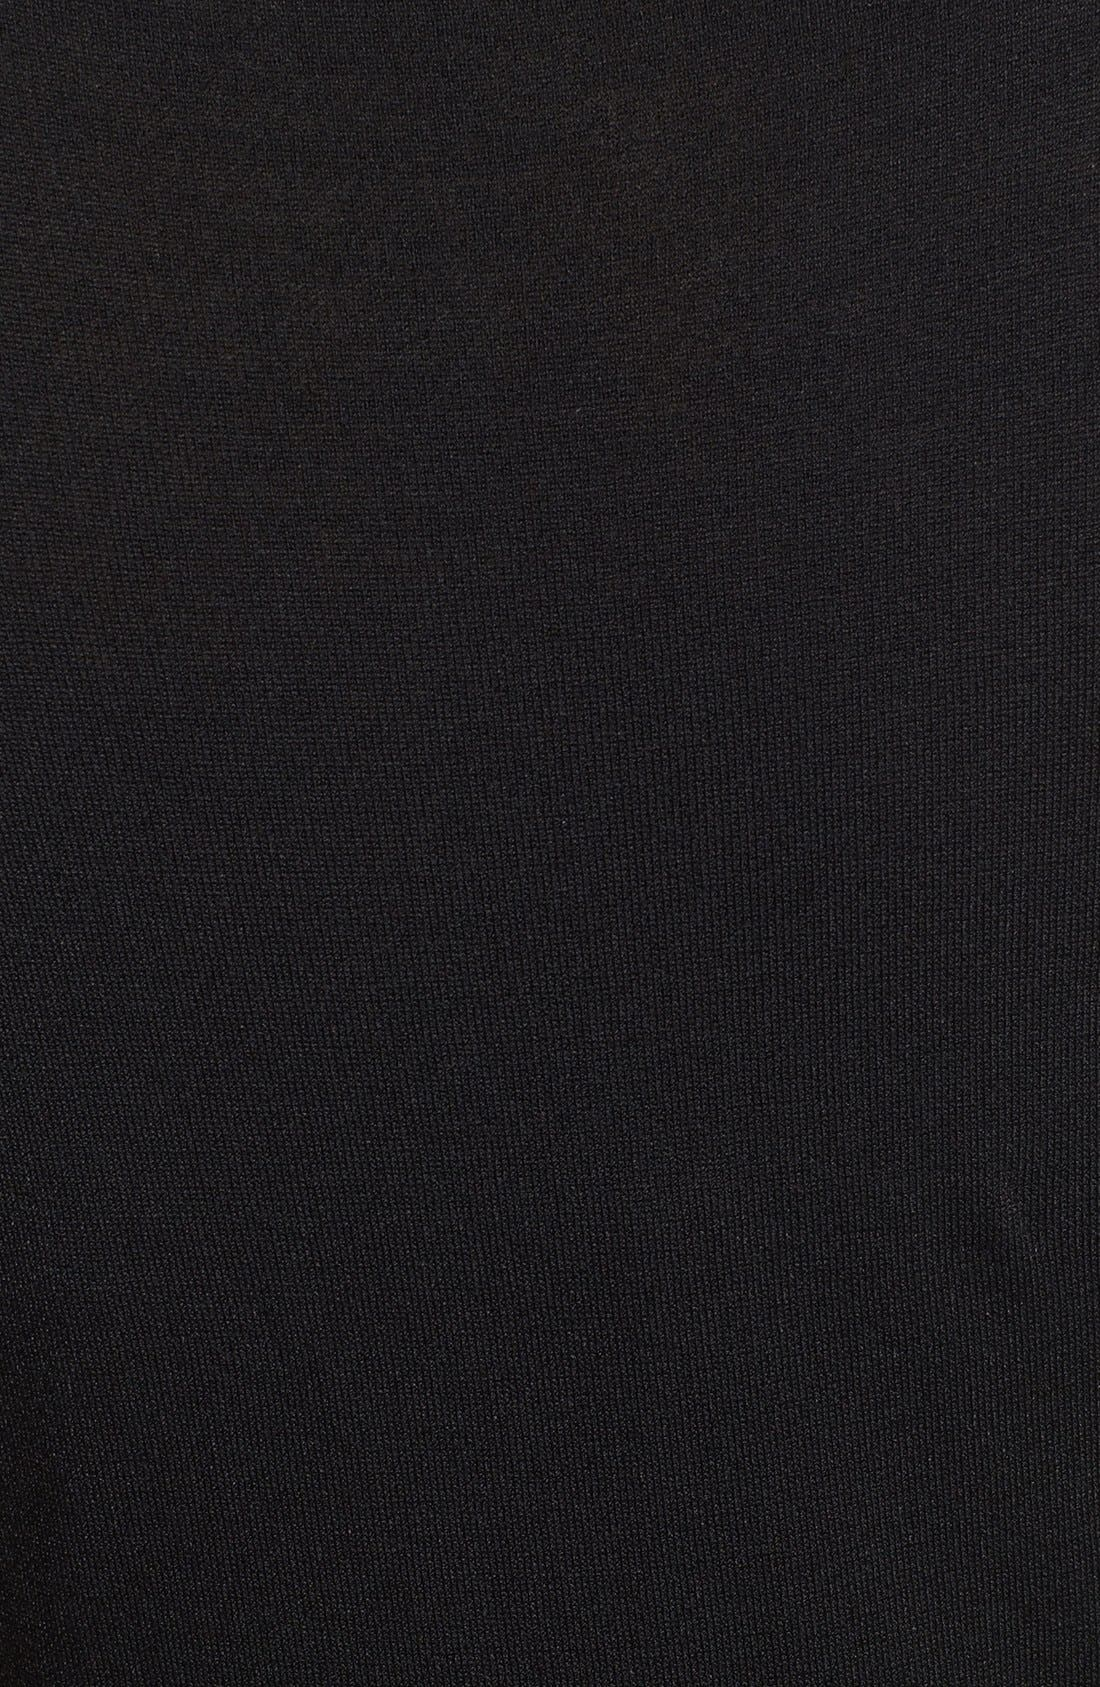 Alternate Image 3  - Chaus Faux Leather Trim Dress